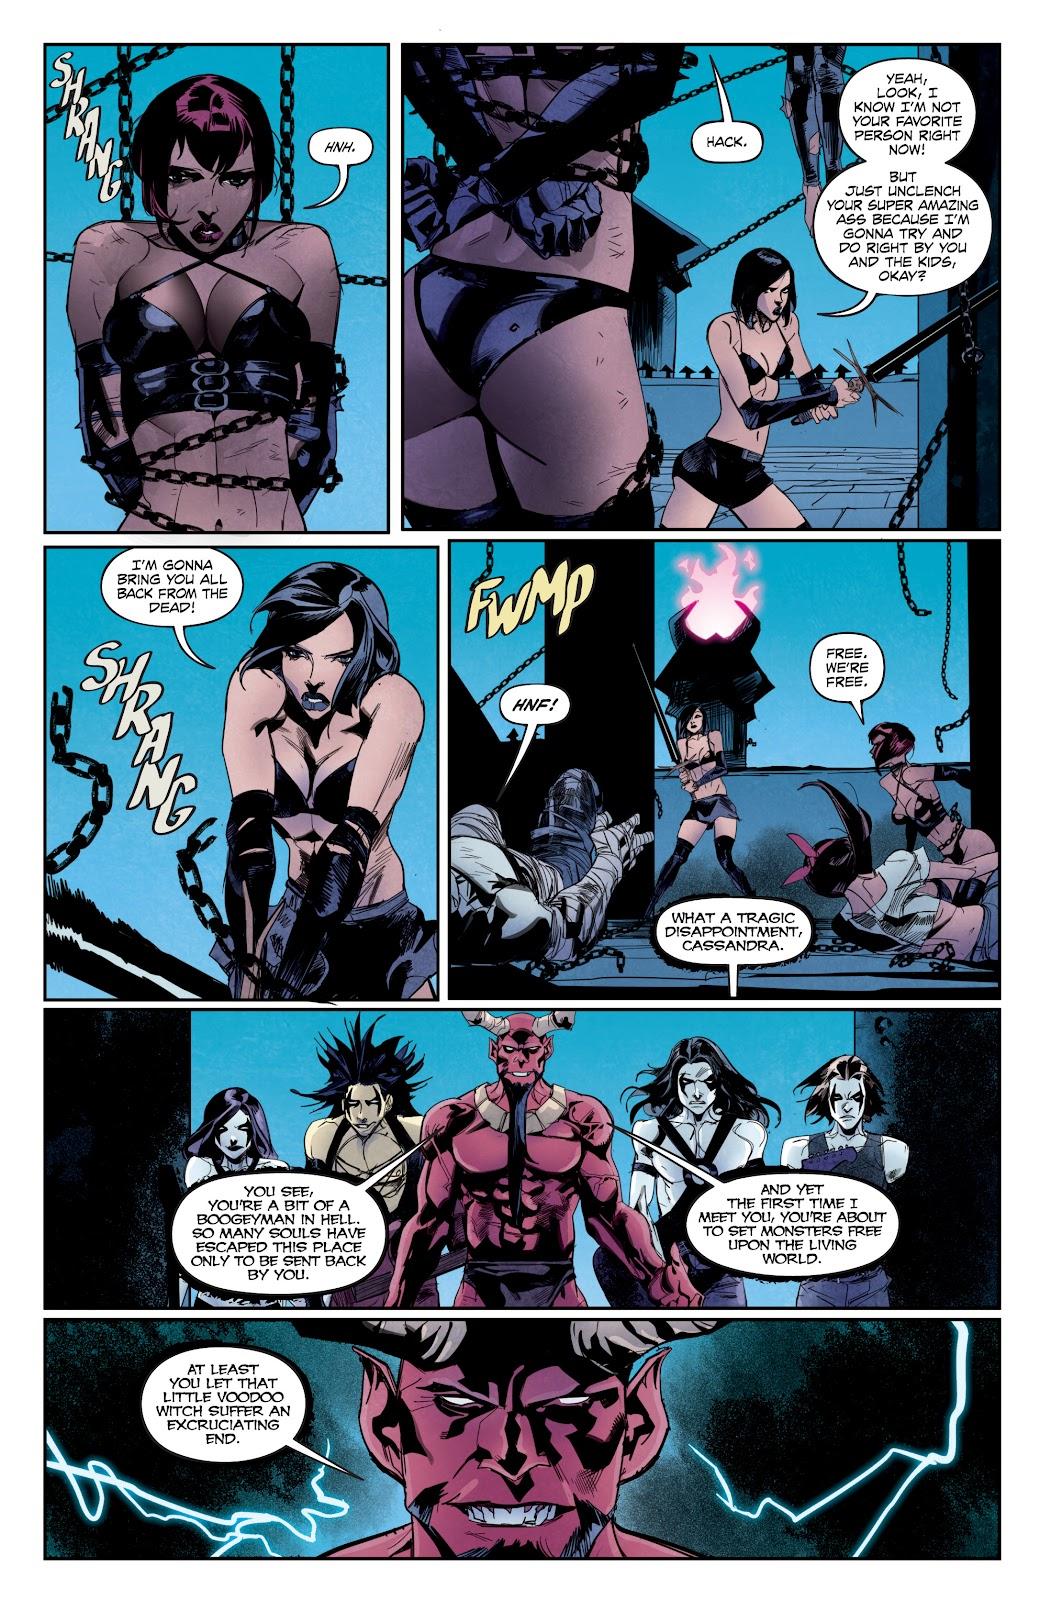 Read online Hack/Slash vs. Chaos comic -  Issue #5 - 12